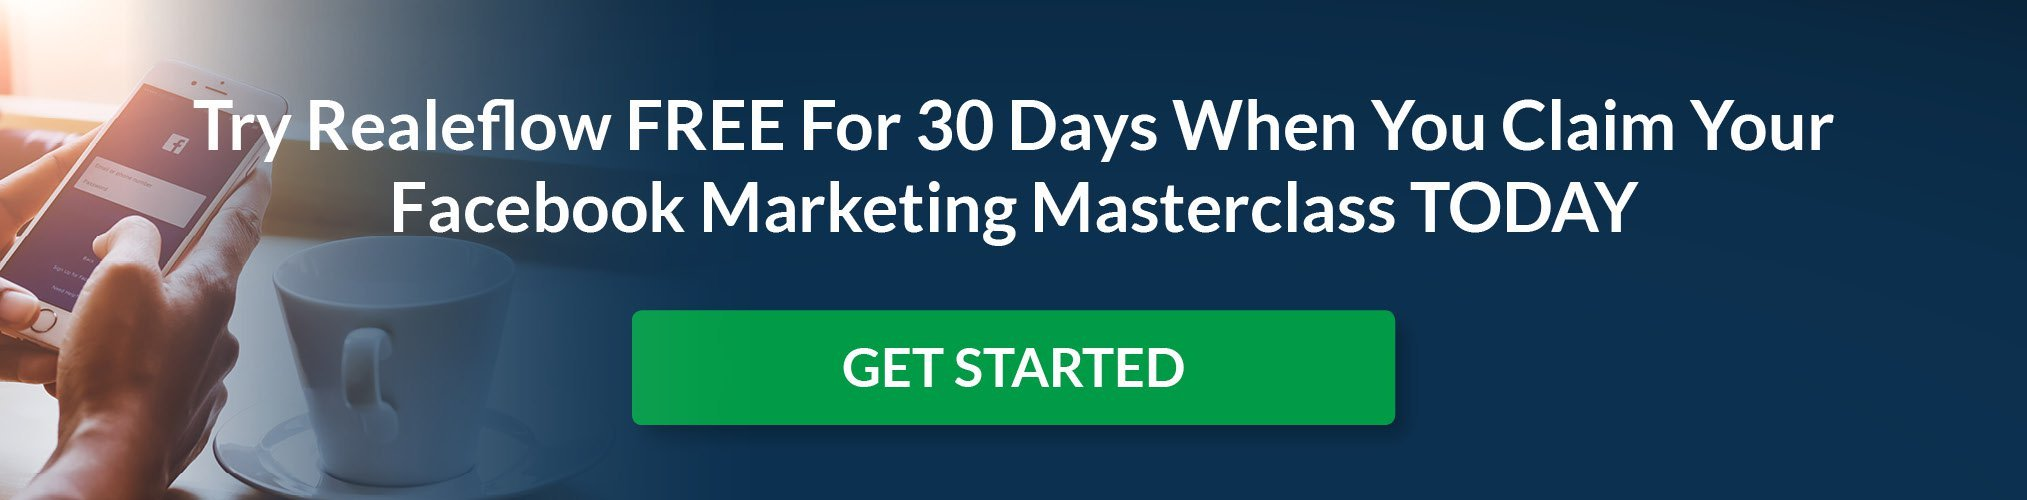 Facebook Marketing Masterclass Button